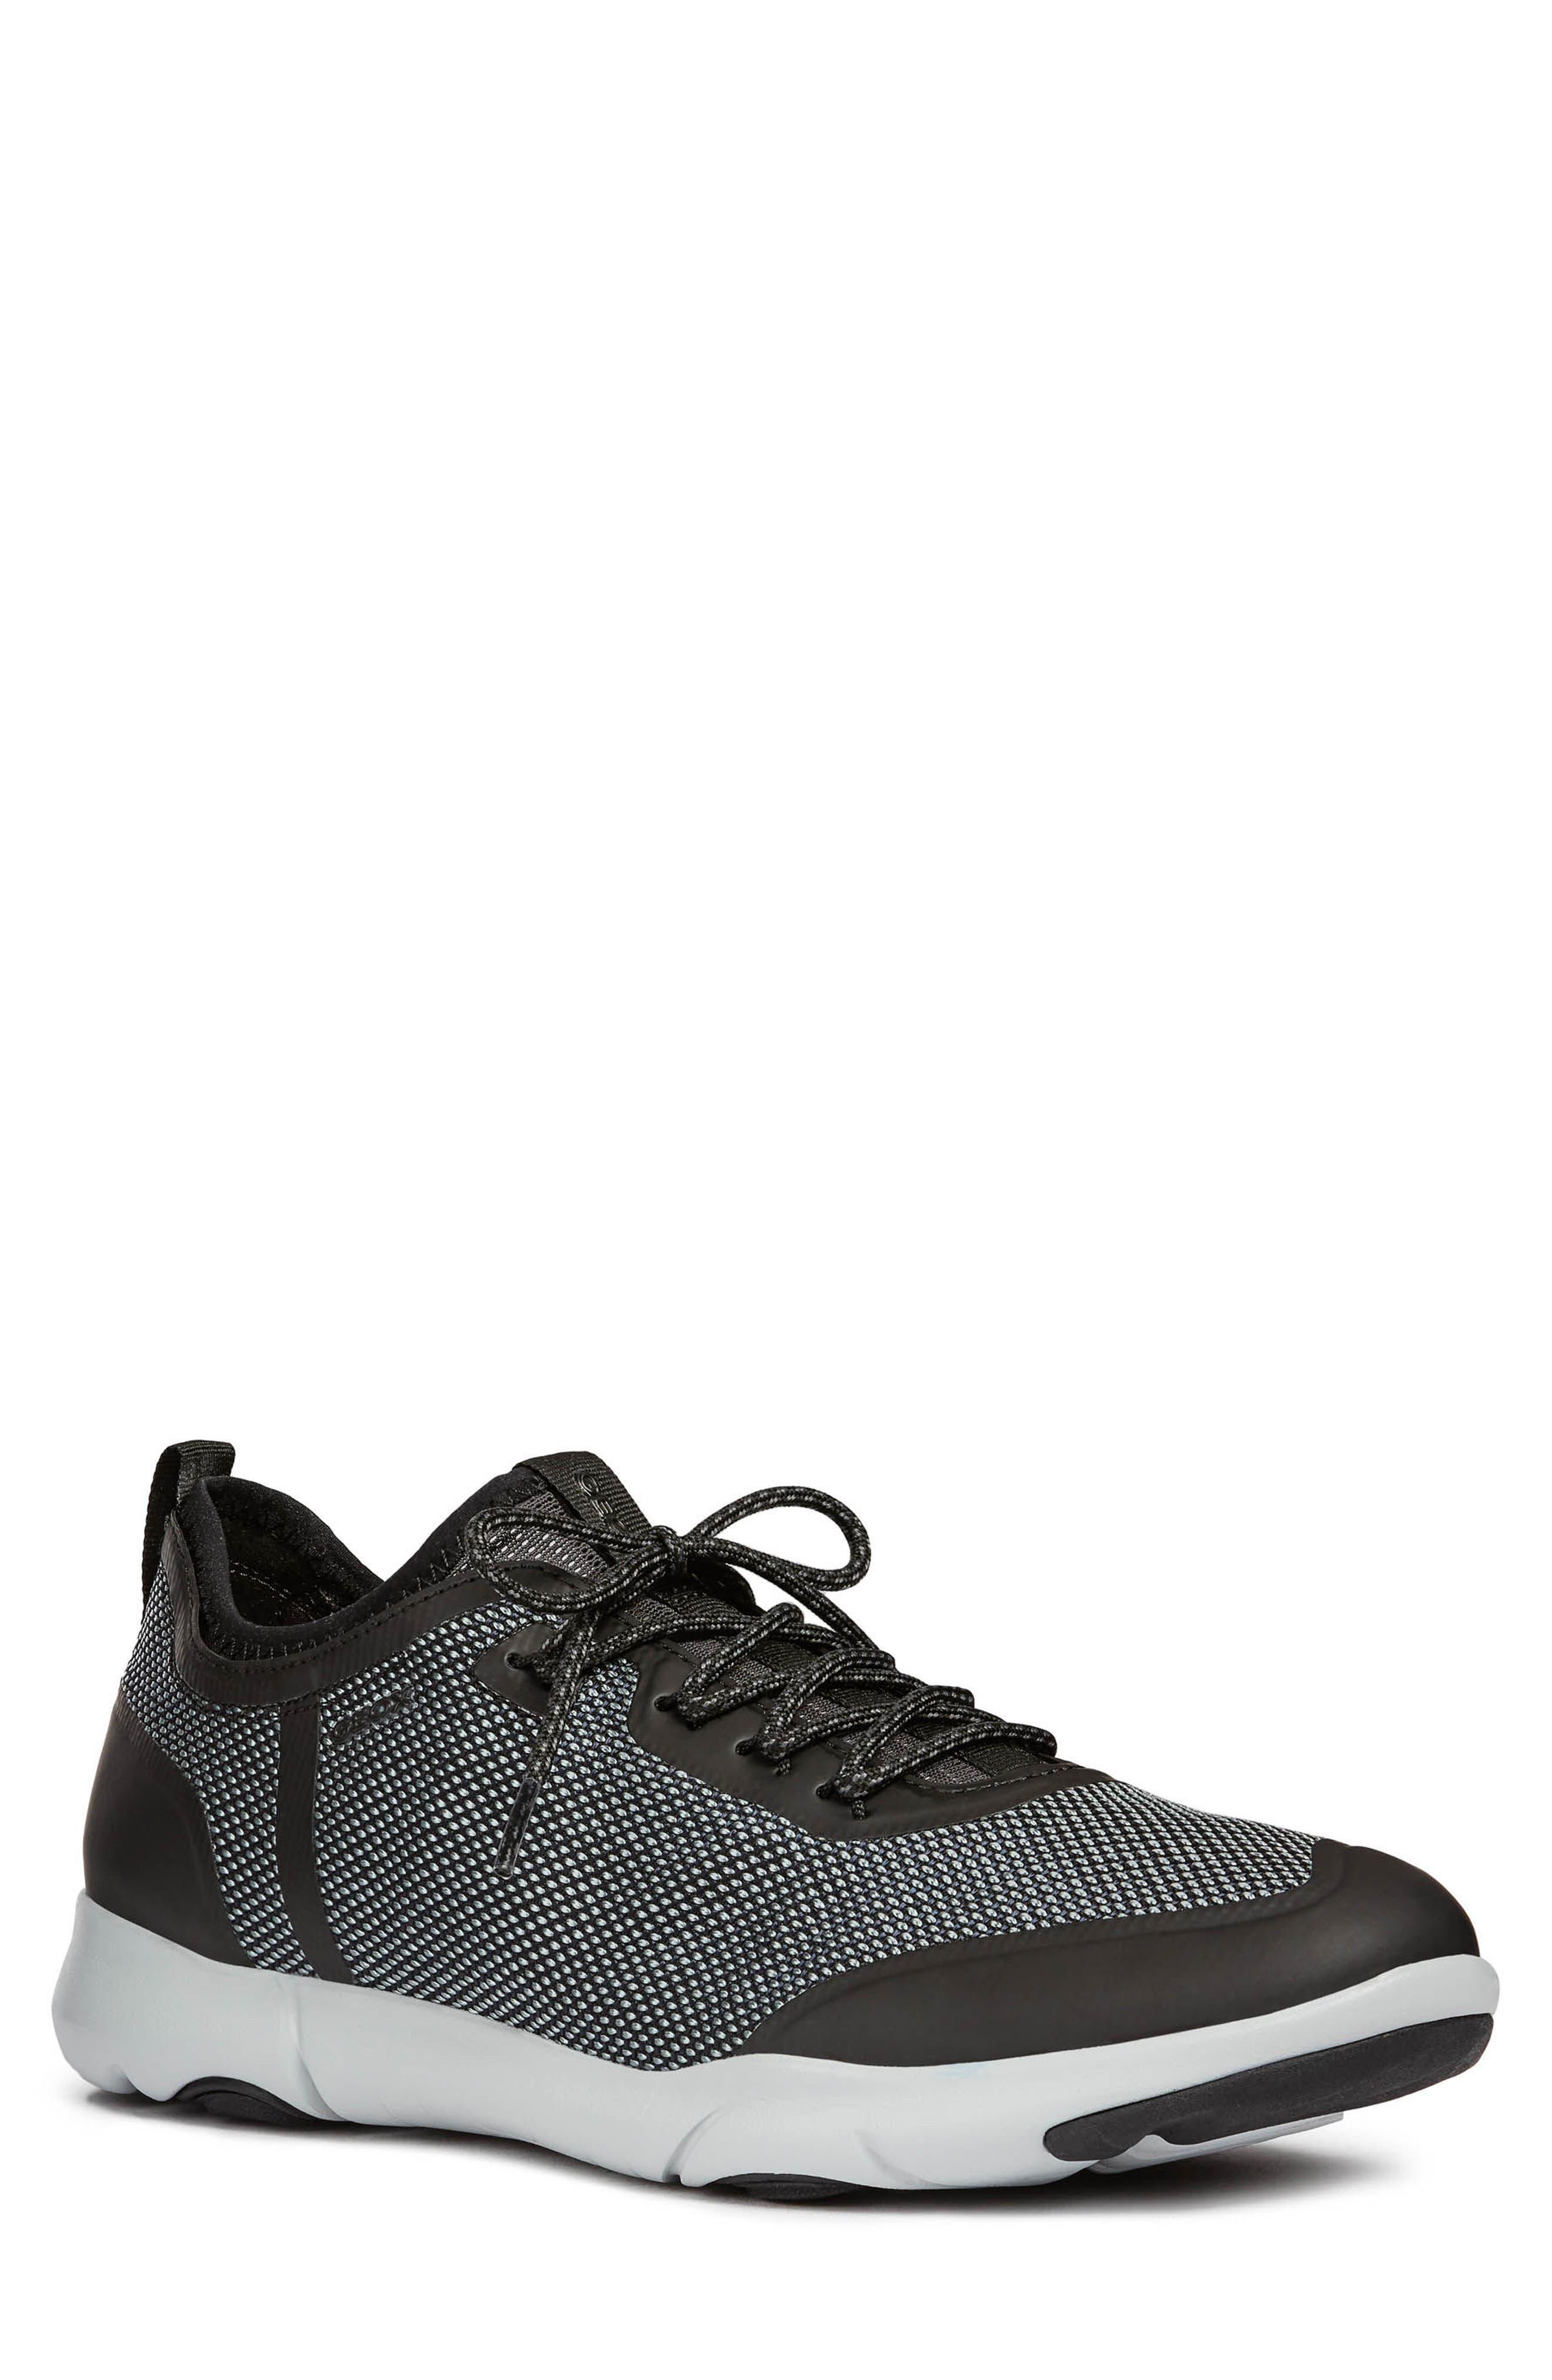 Geox Nebula X 3 Low Top Sneaker, Black